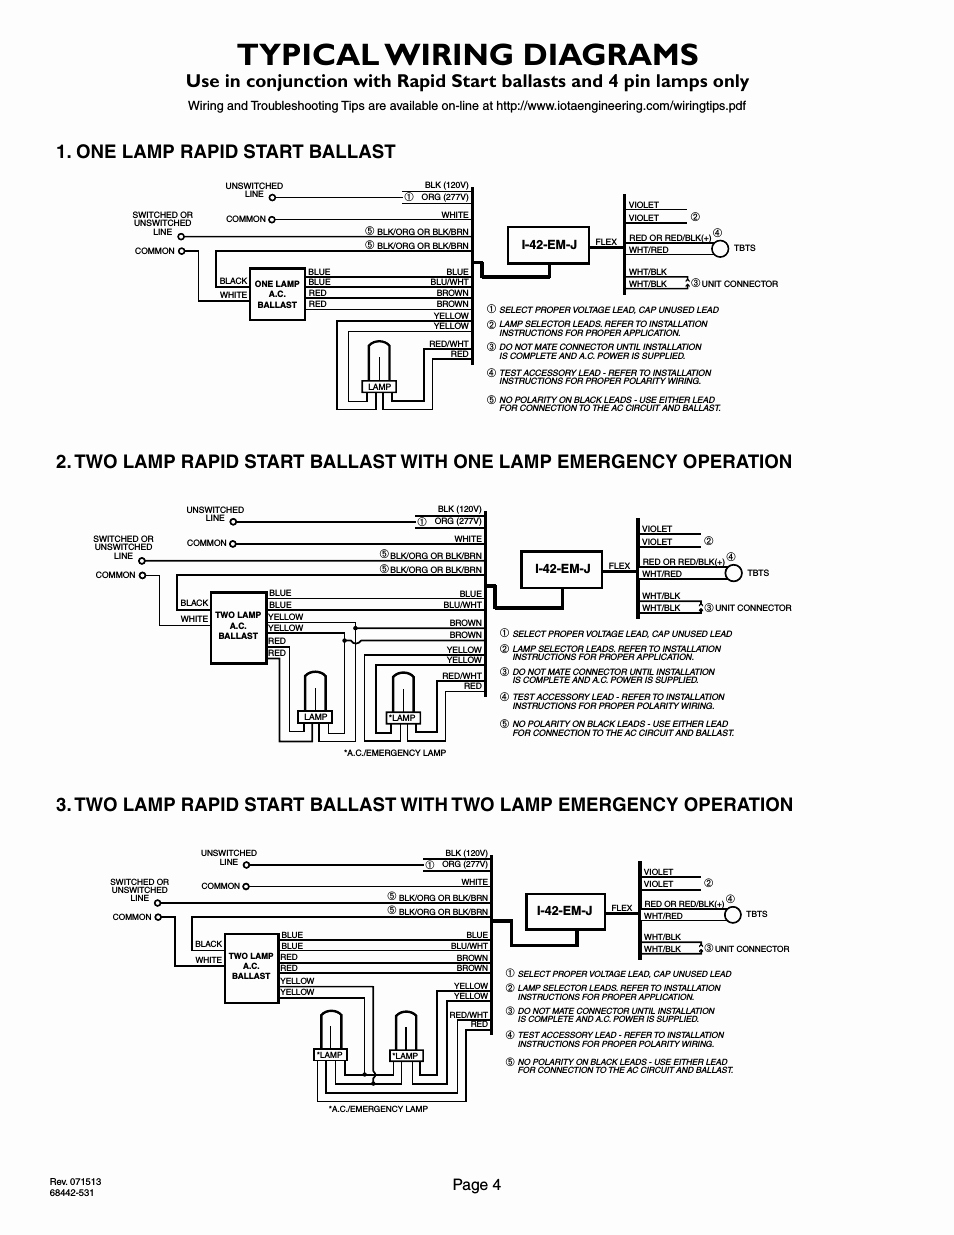 iota i320 emergency ballast wiring diagram lutron maestro wireless lighting best library full size philips